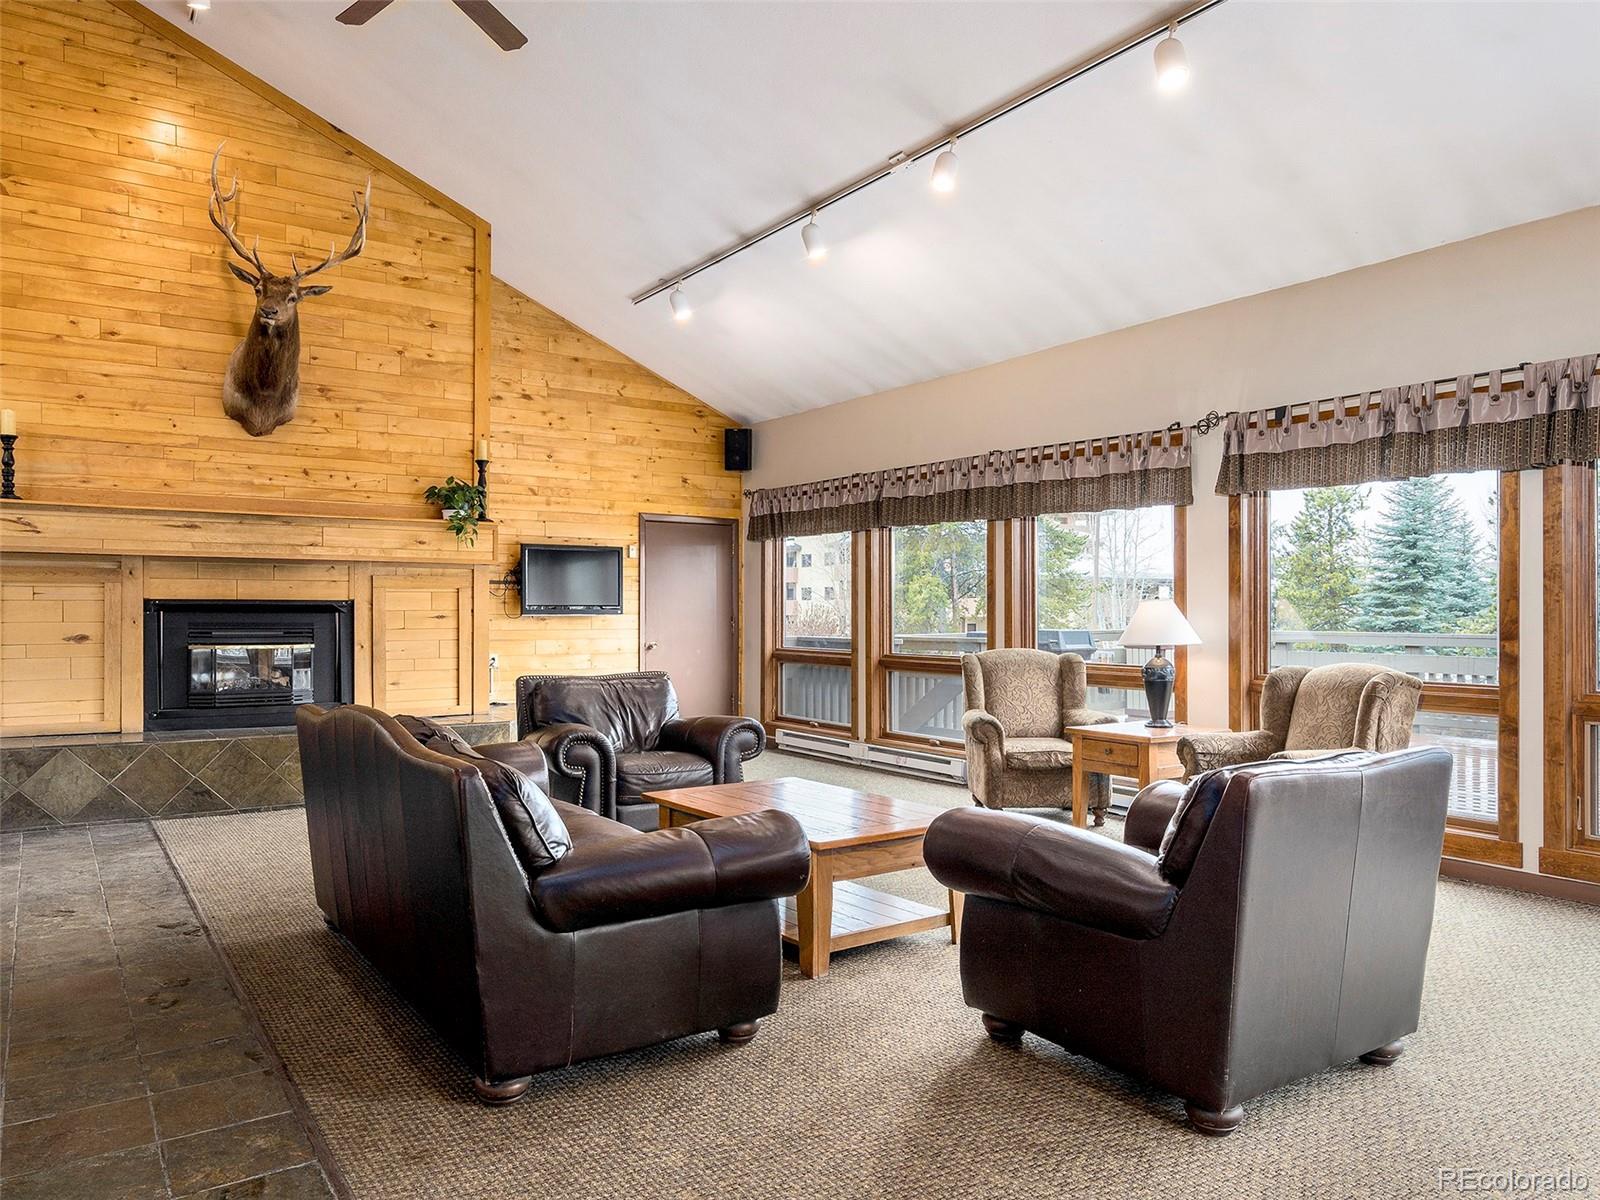 MLS# 4193338 - 18 - 2700 Village Drive #D-204, Steamboat Springs, CO 80487